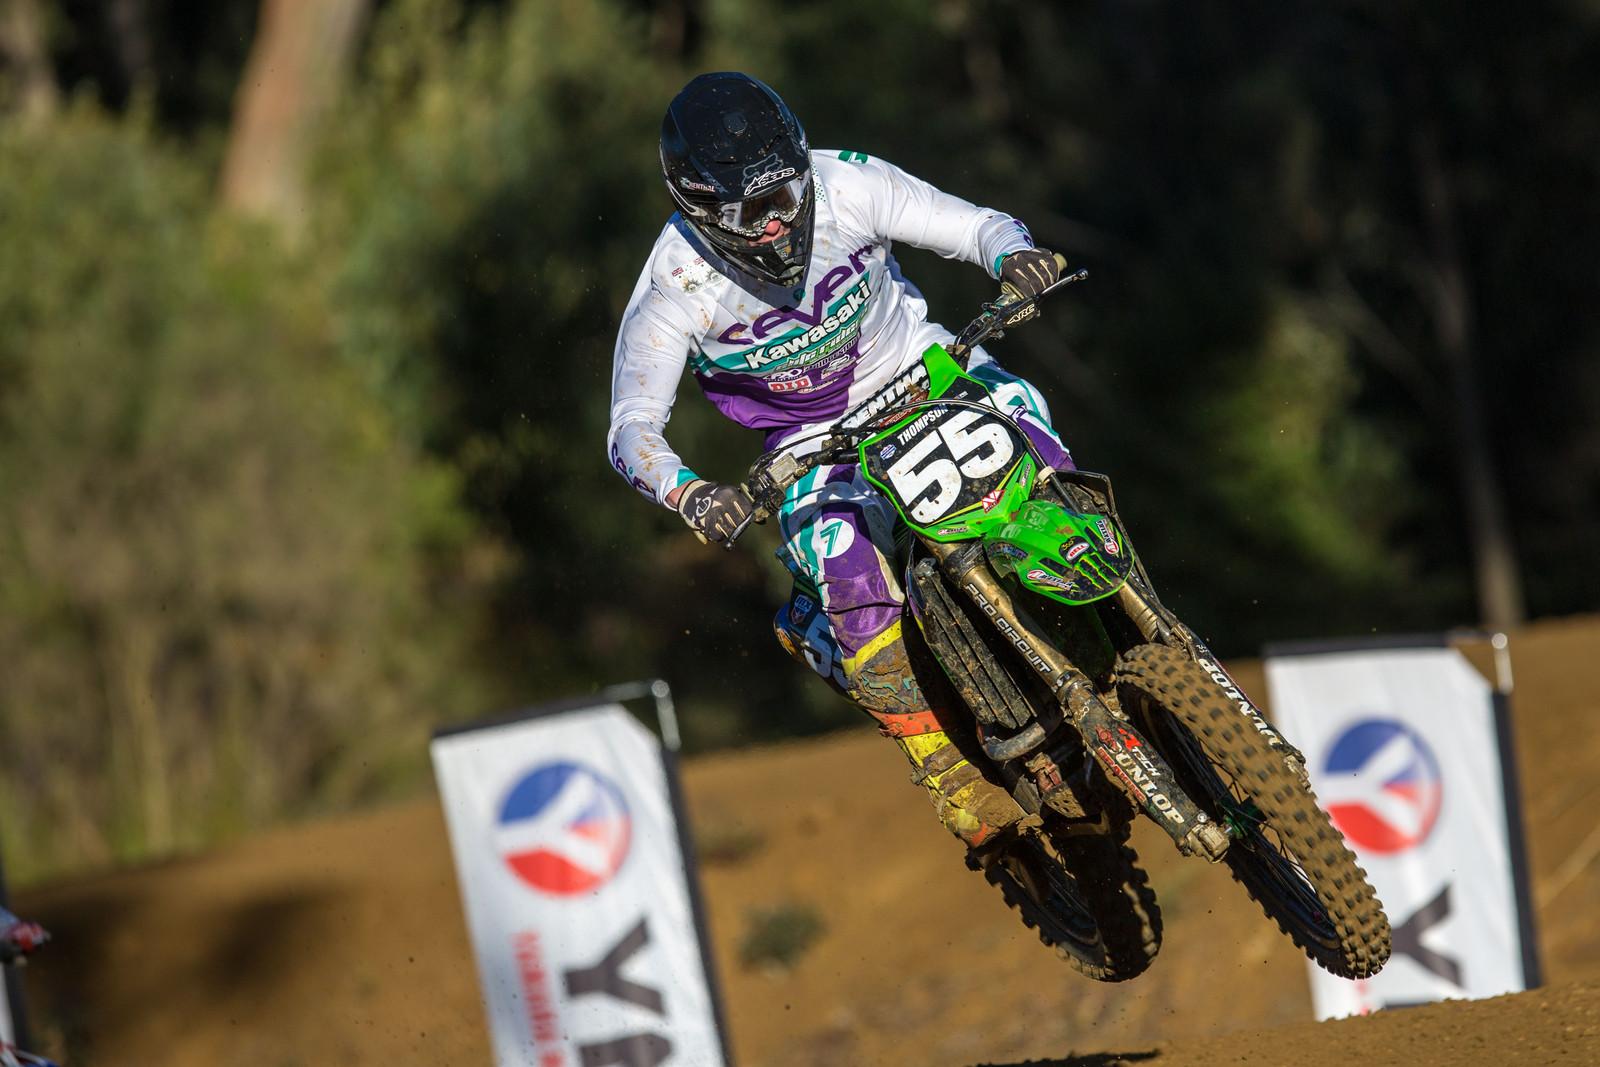 Ben Thompson - Australian Motul MX Championships: Round 6, Nowra - Motocross Pictures - Vital MX